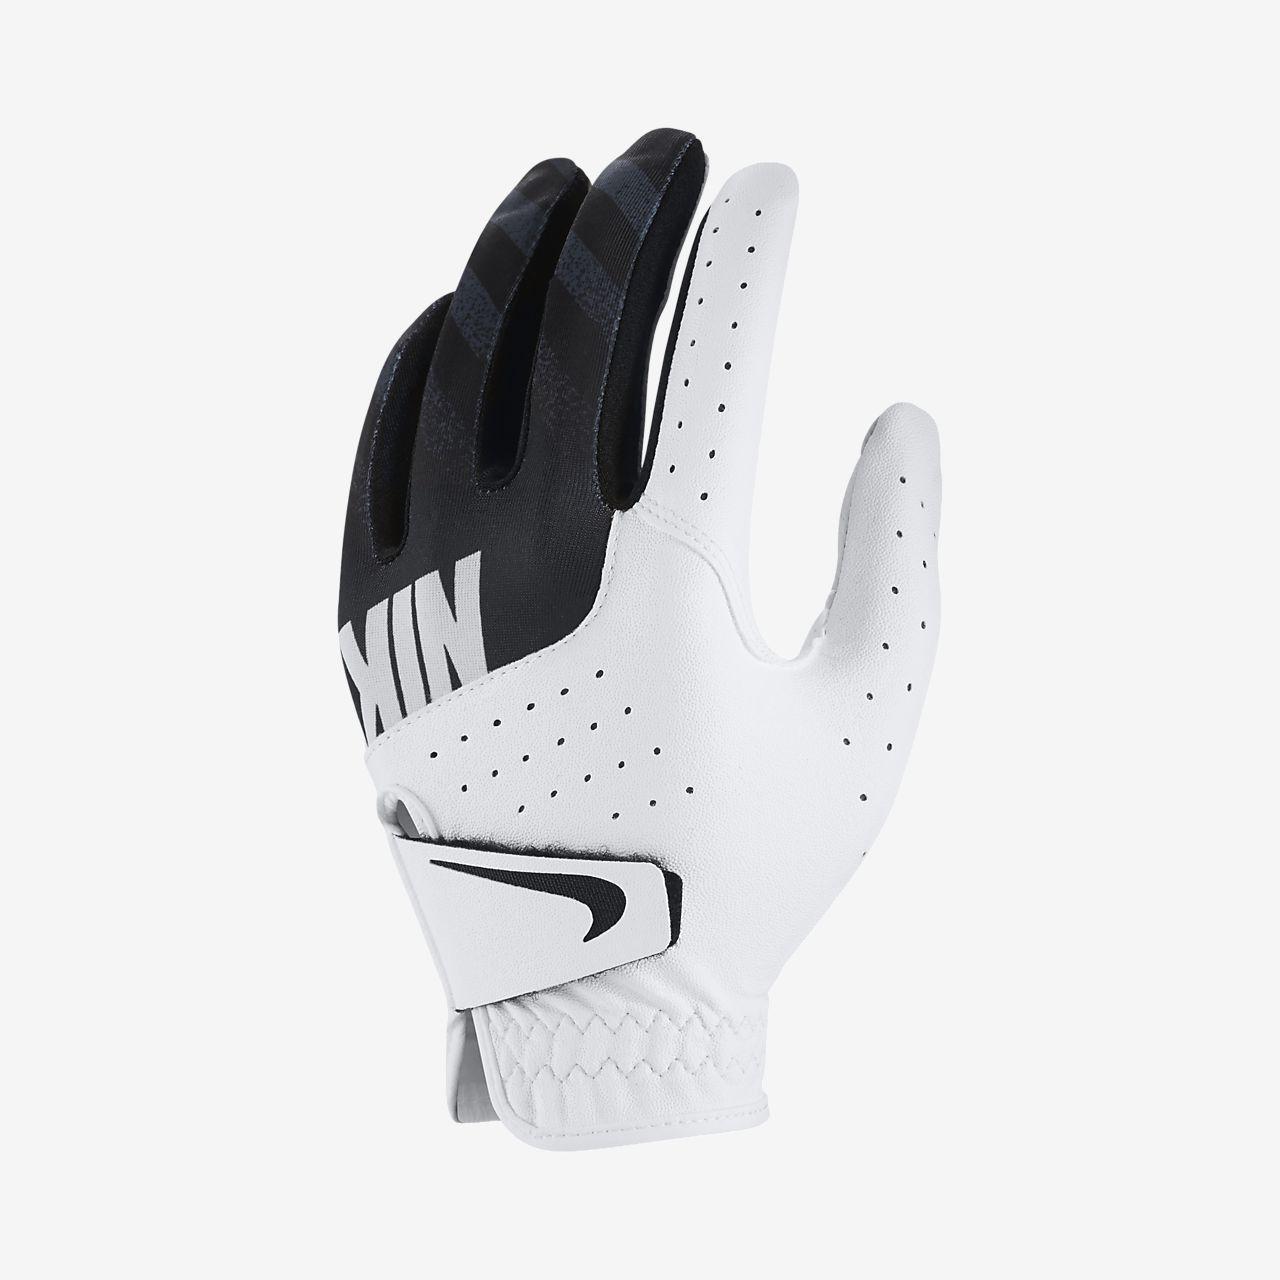 super popular 02d6a 692f9 ... Gant de golf Nike Sport pour Enfant (standard gaucher)